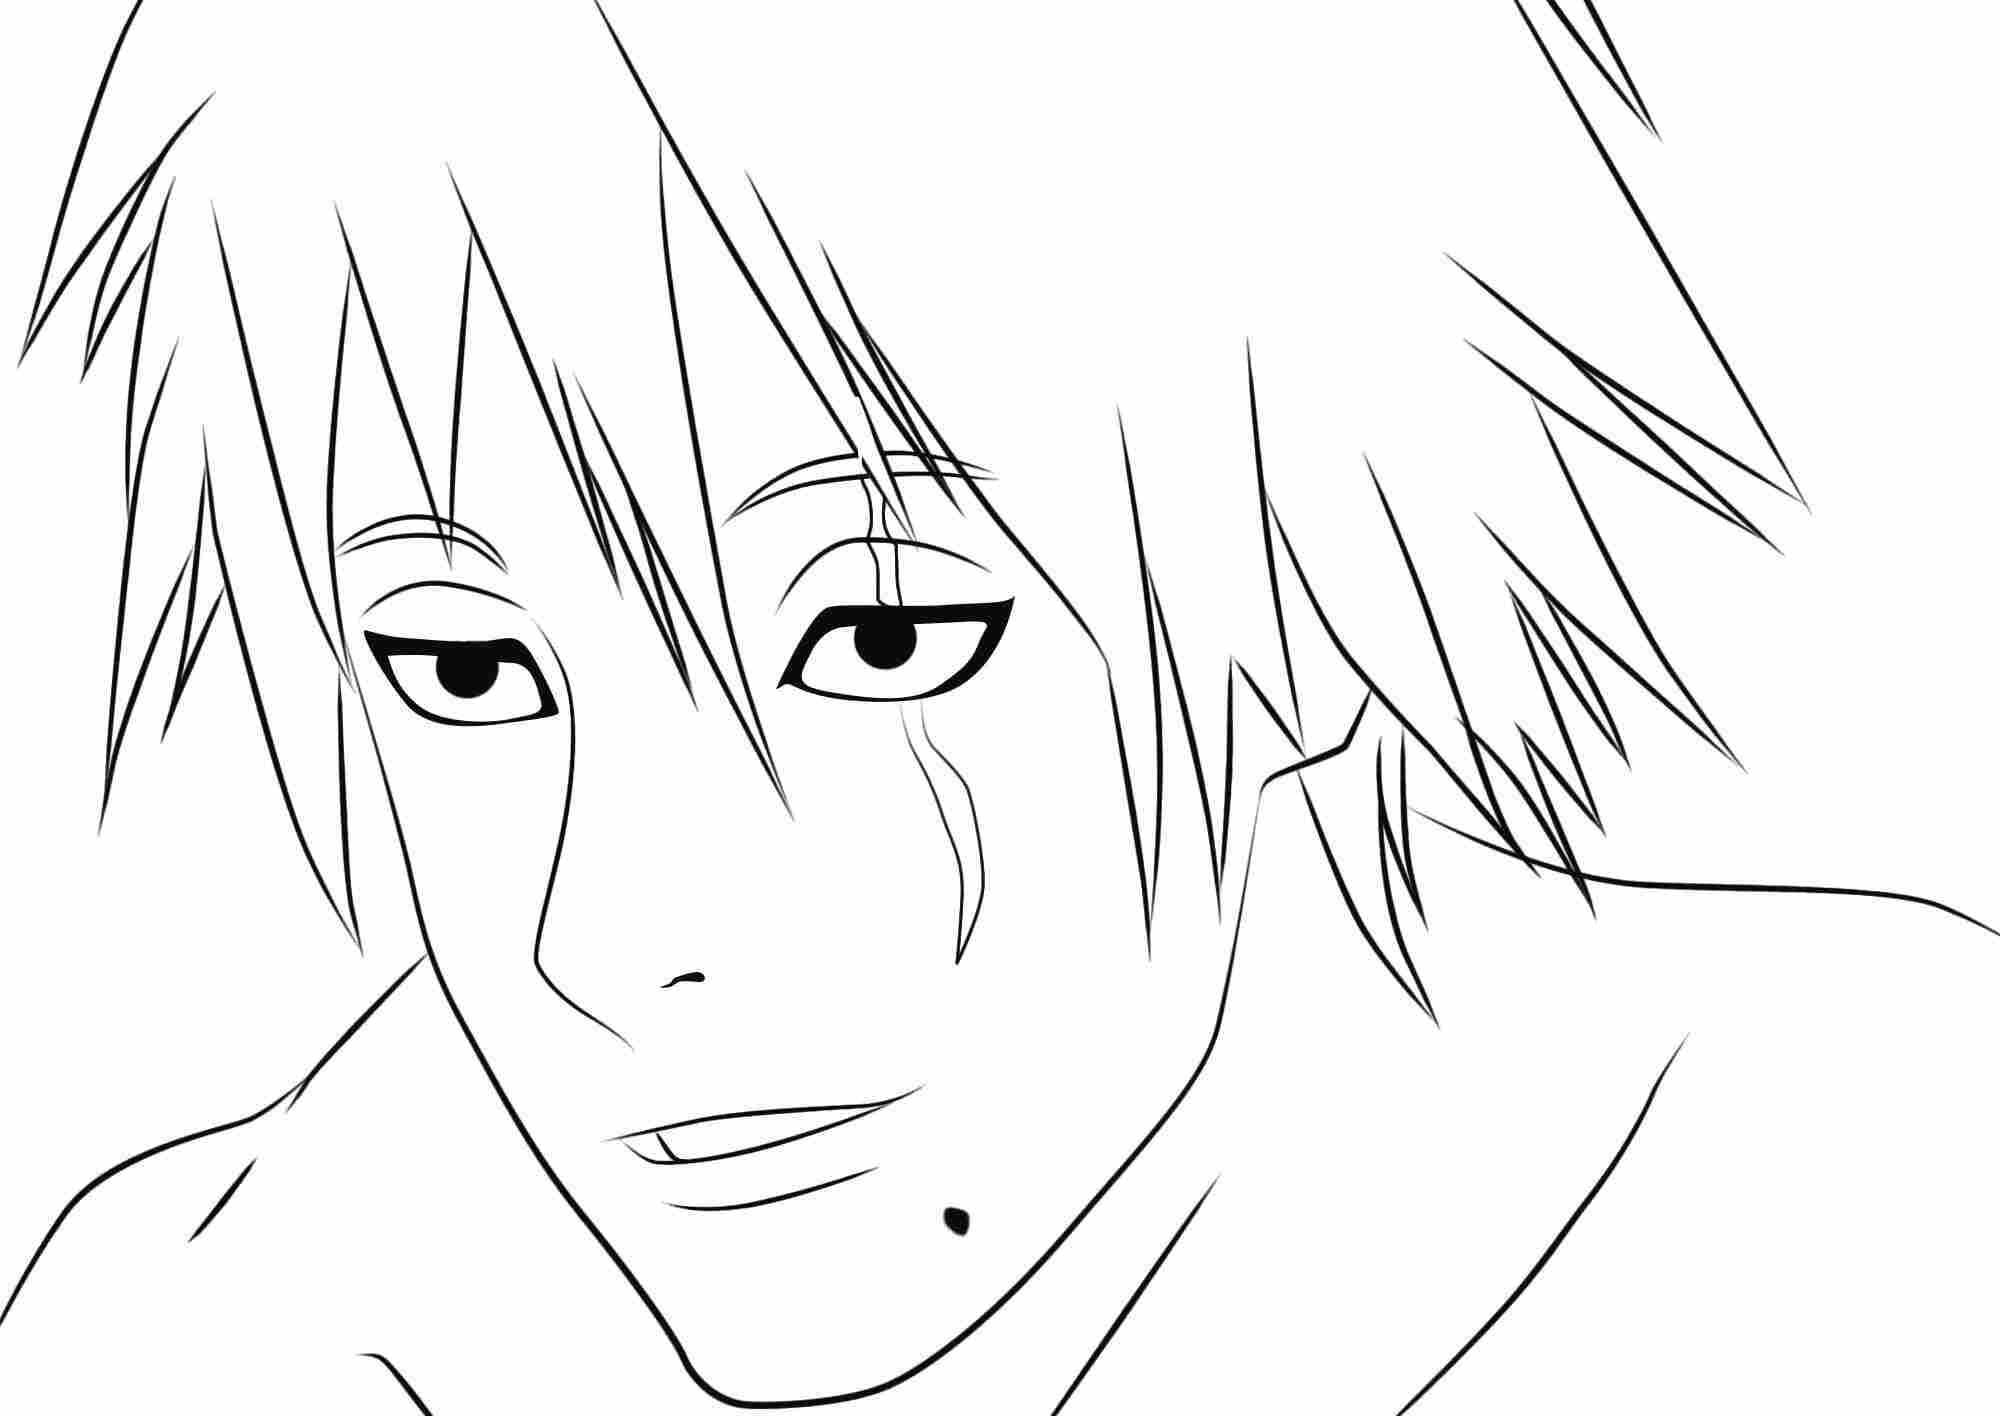 Kakashi from Naruto unmask Coloring Page